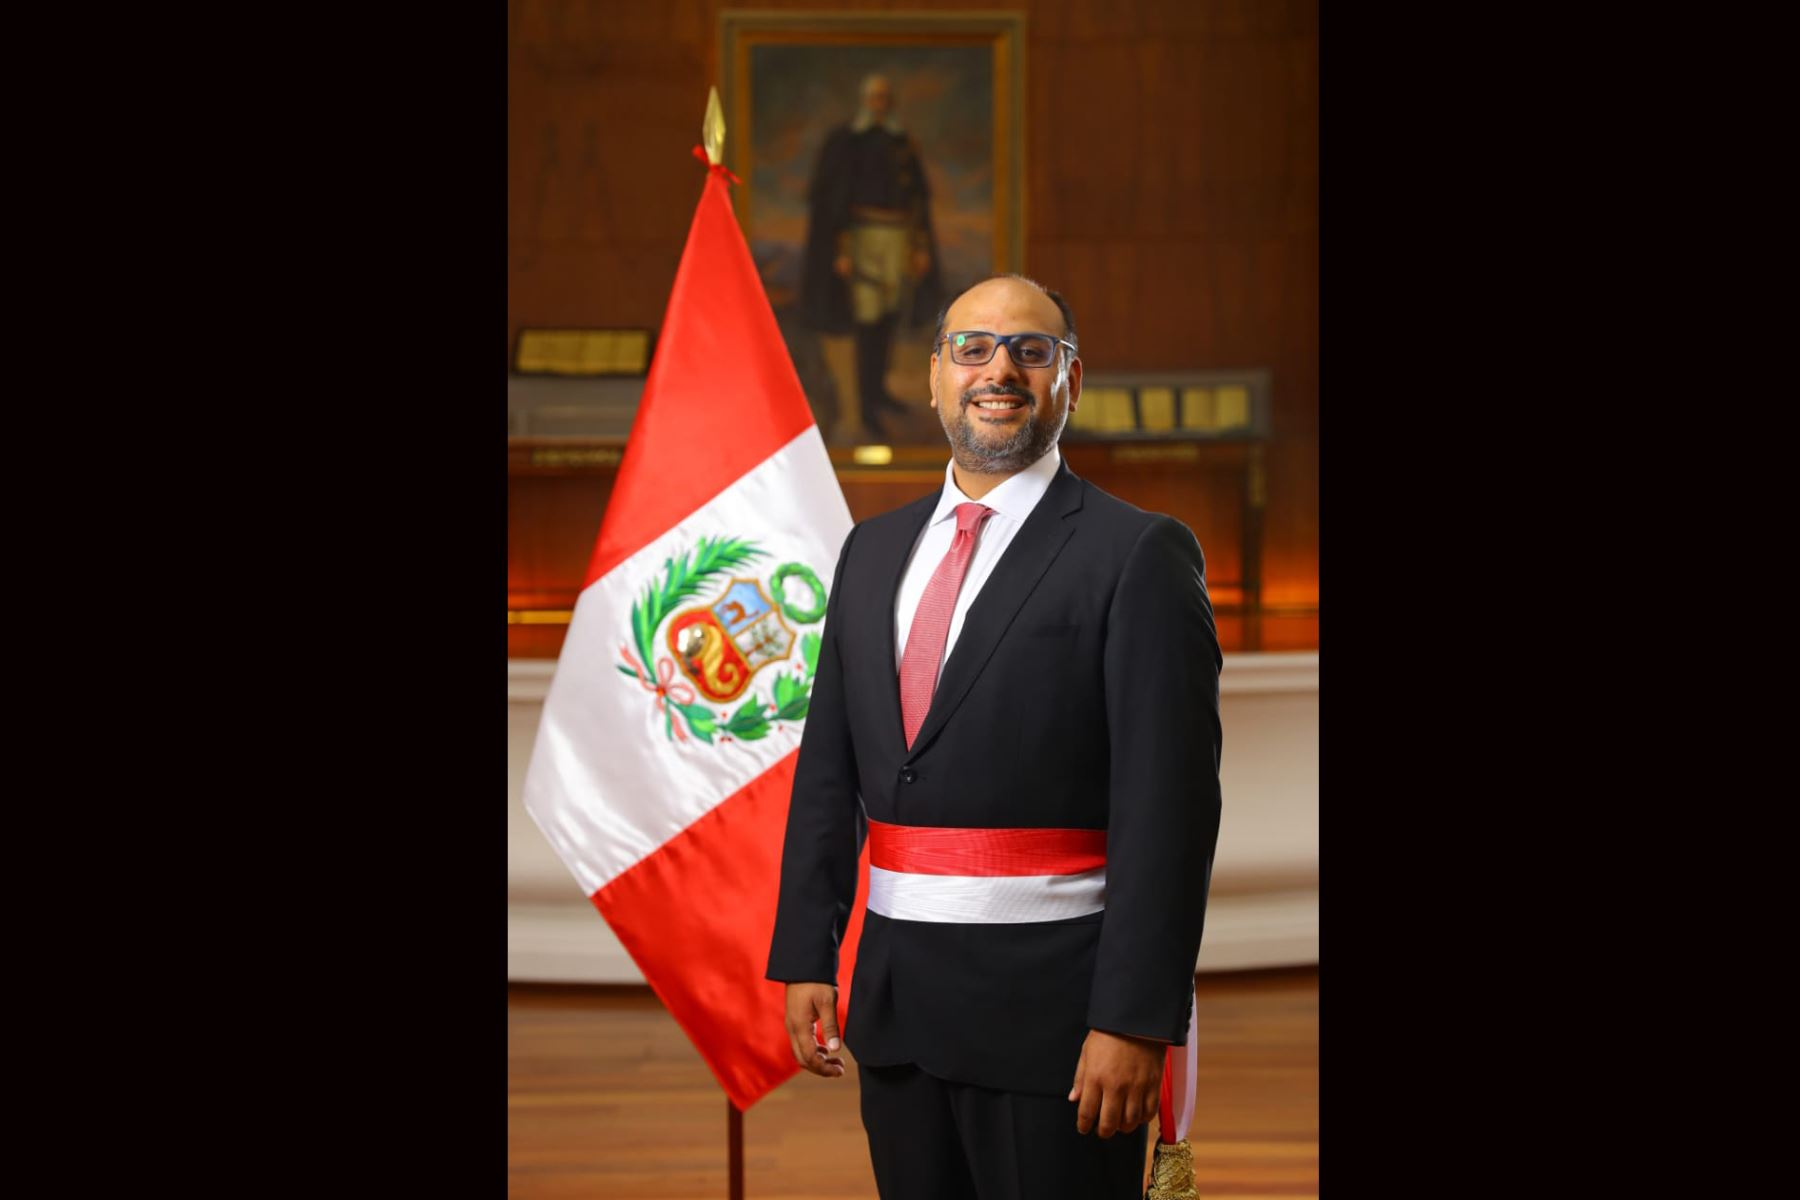 Daniel Alfaro Paredes, Ministro de Educación. Foto: ANDINA/ Prensa Presidencia